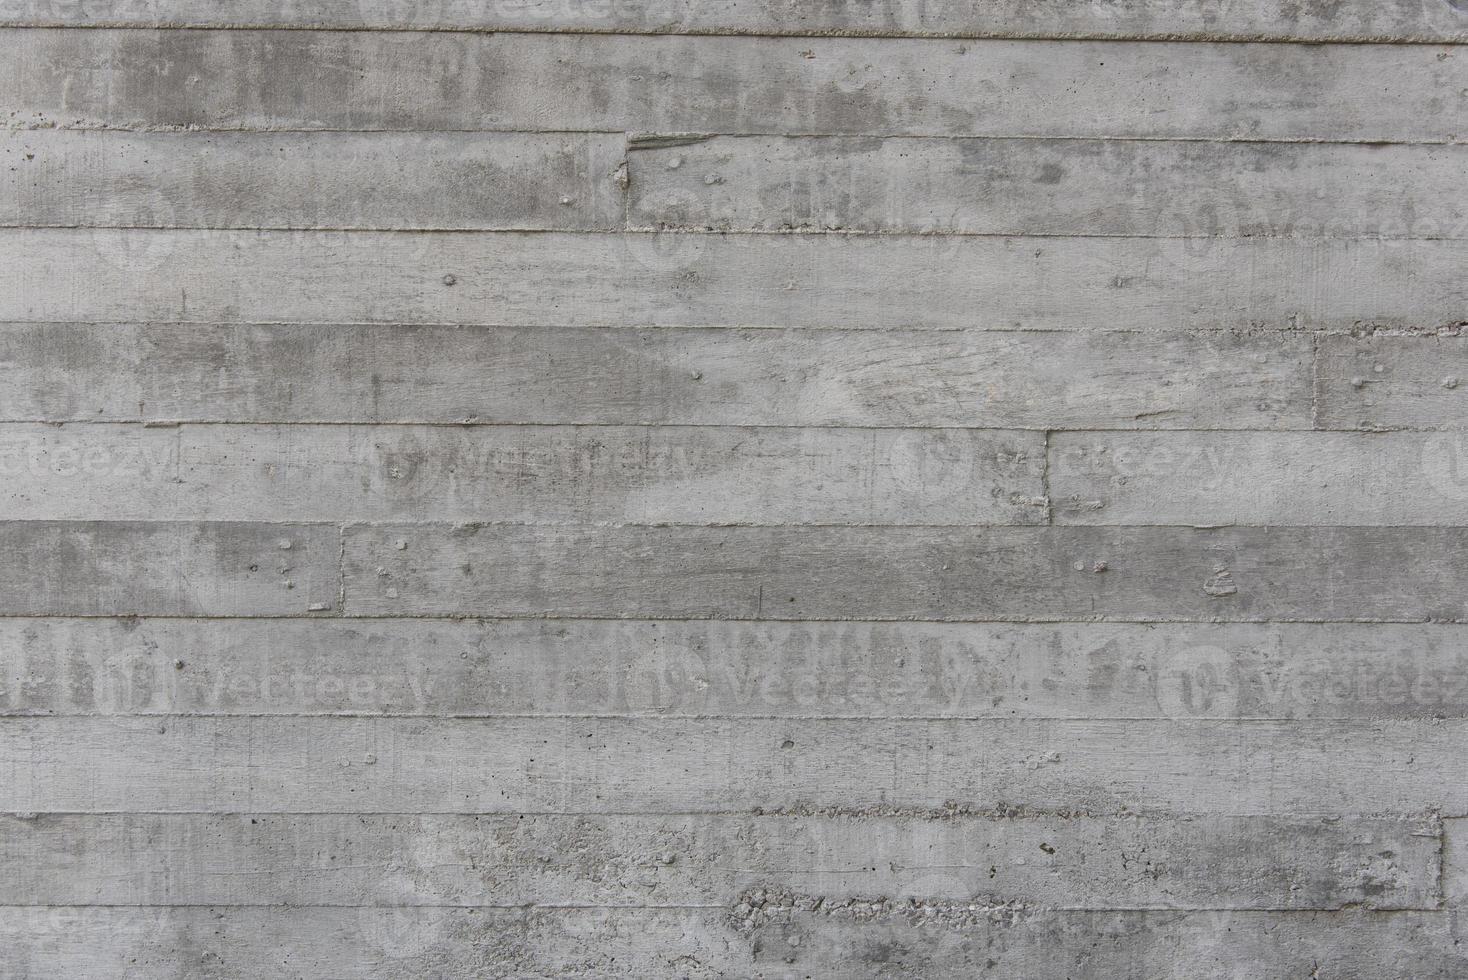 muro de concreto bruto foto